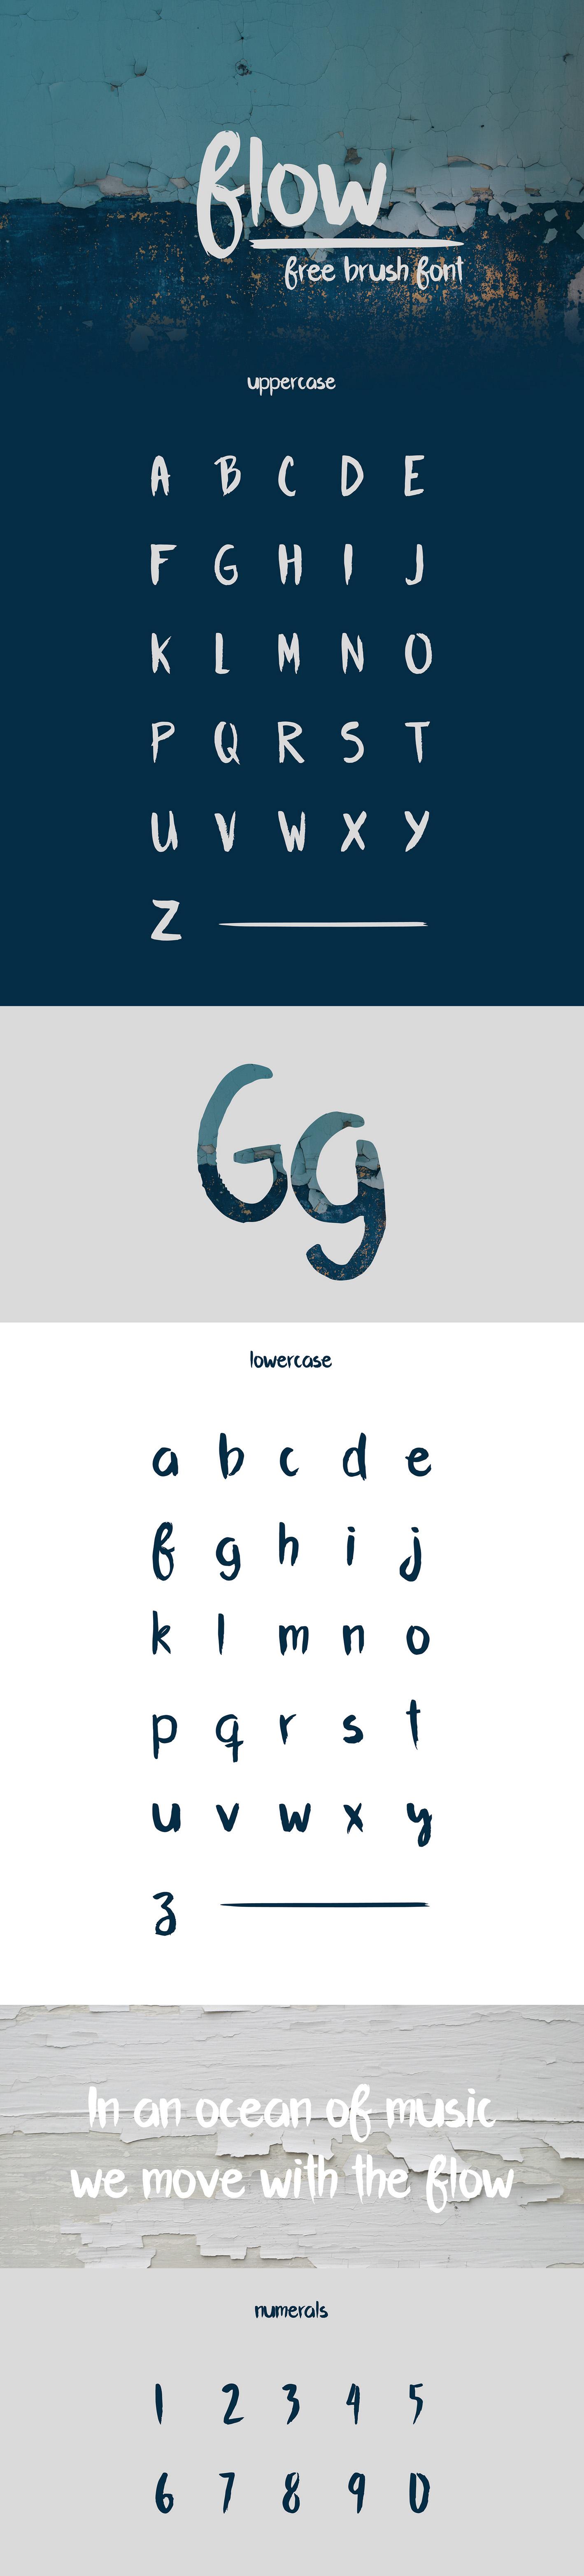 Flow I free brush font on Behance